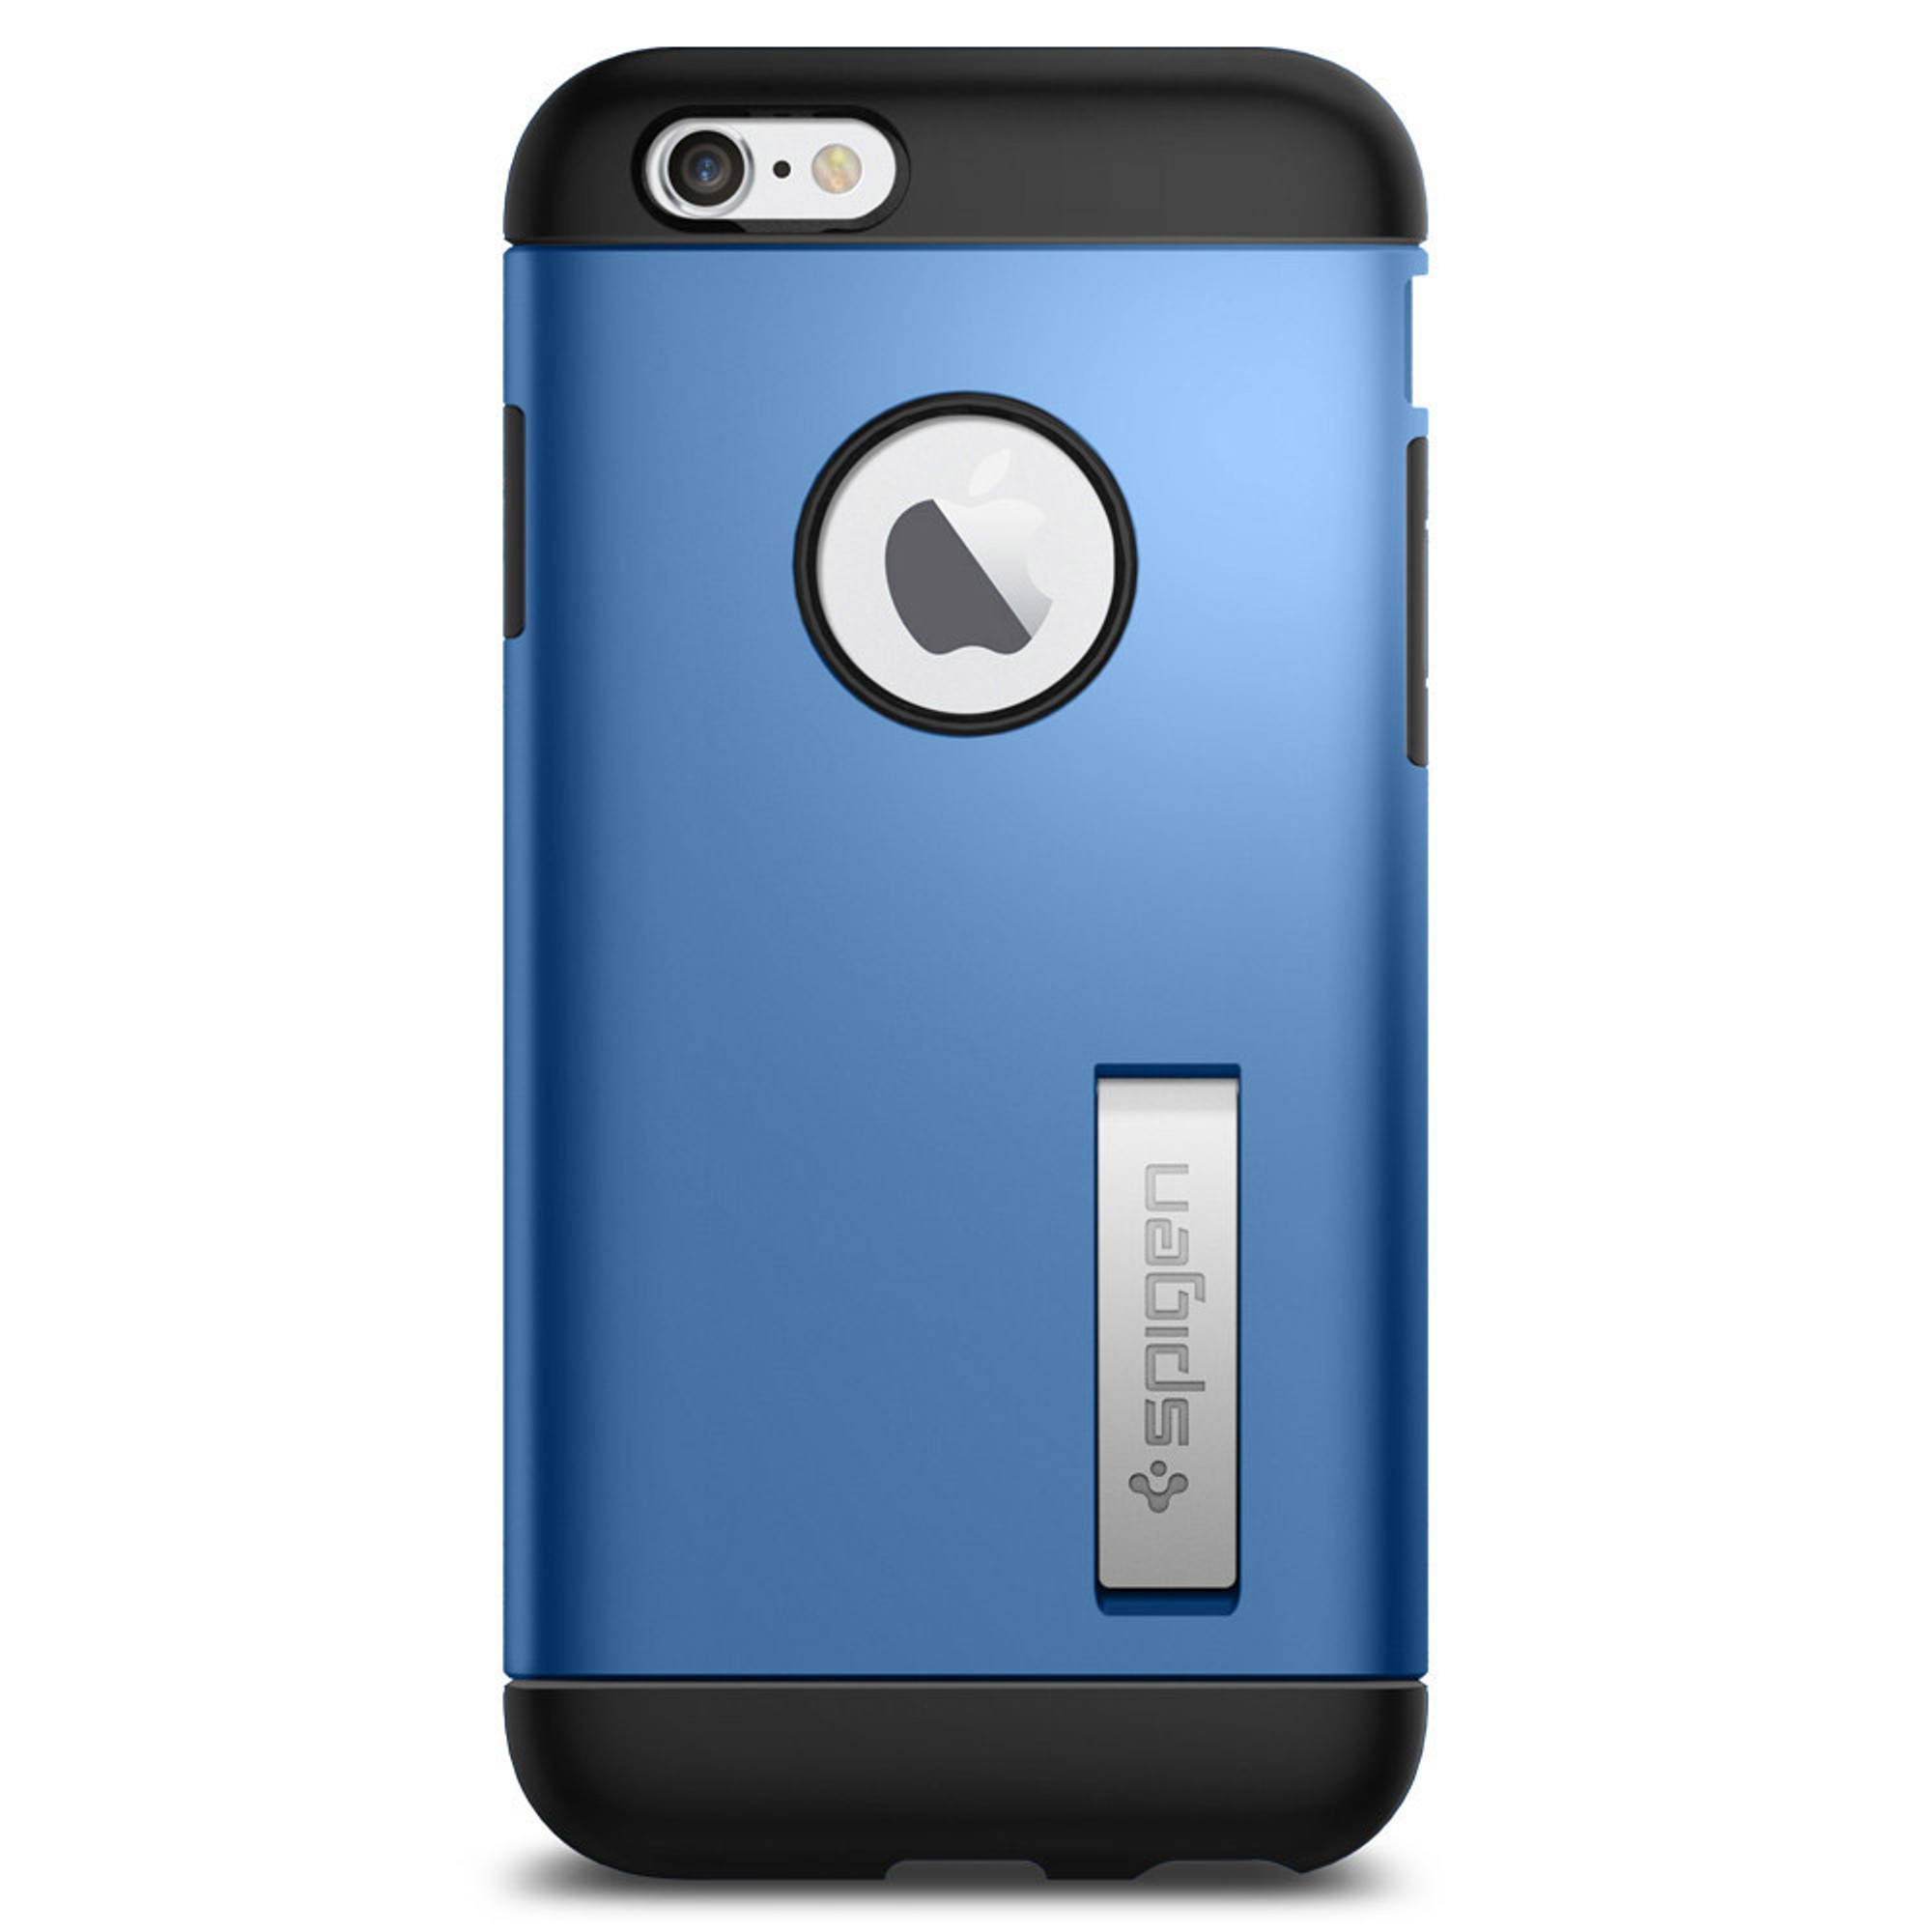 cheaper 62b06 81b3d Spigen Slim Armor Kickstand Case for iPhone 6S / 6 - Electric Blue